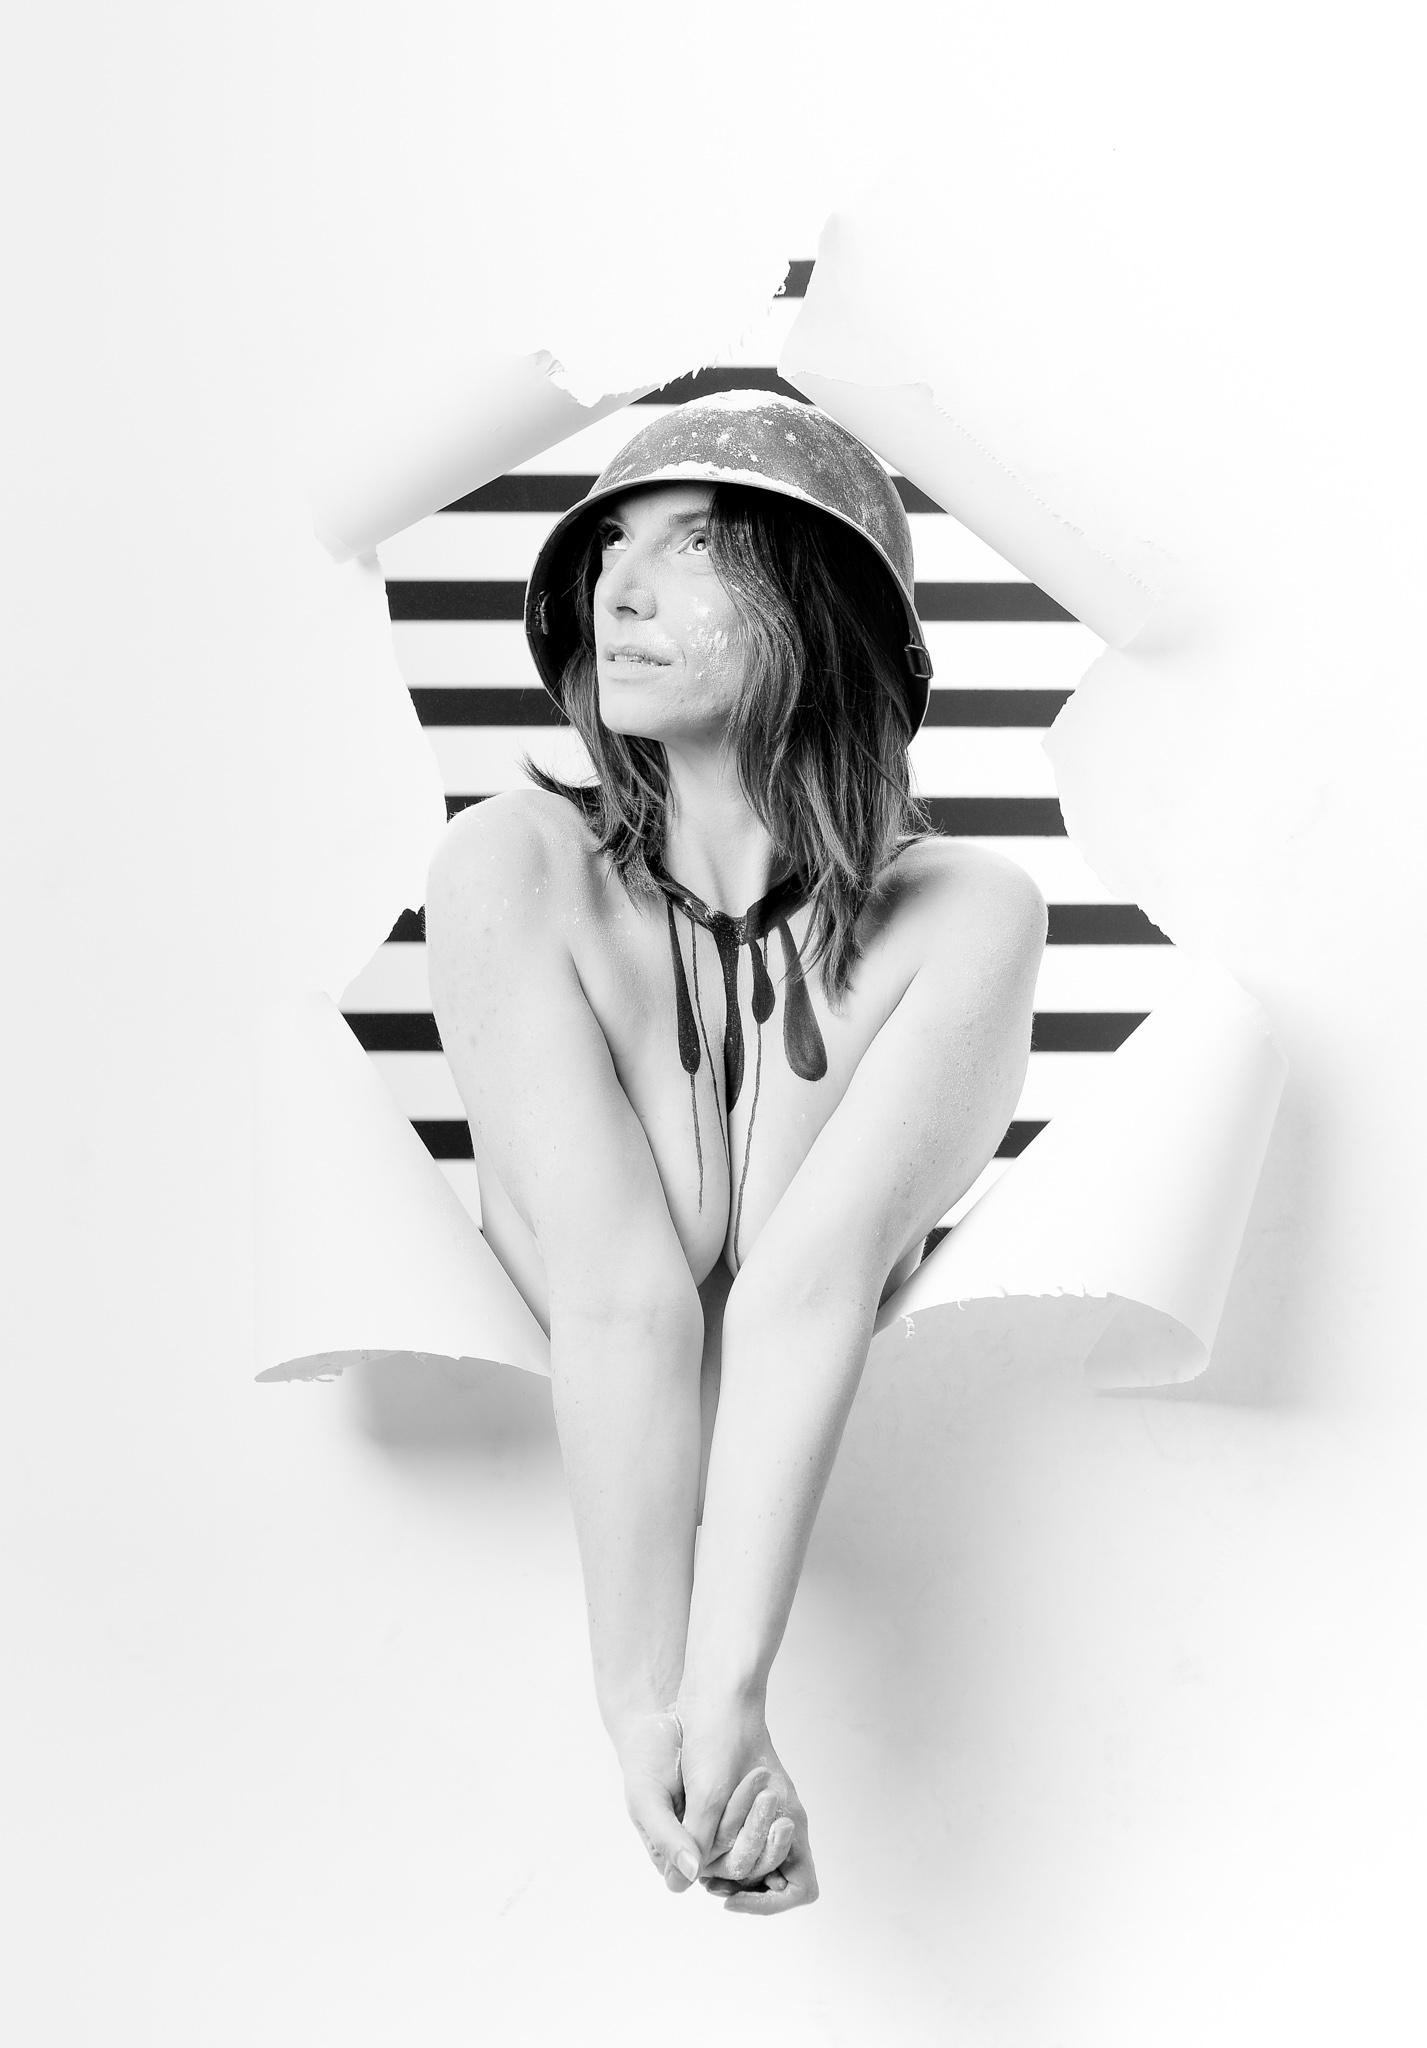 seance shooting photo lyon, photo de femme, photo studio, fond papier dechire, rayure